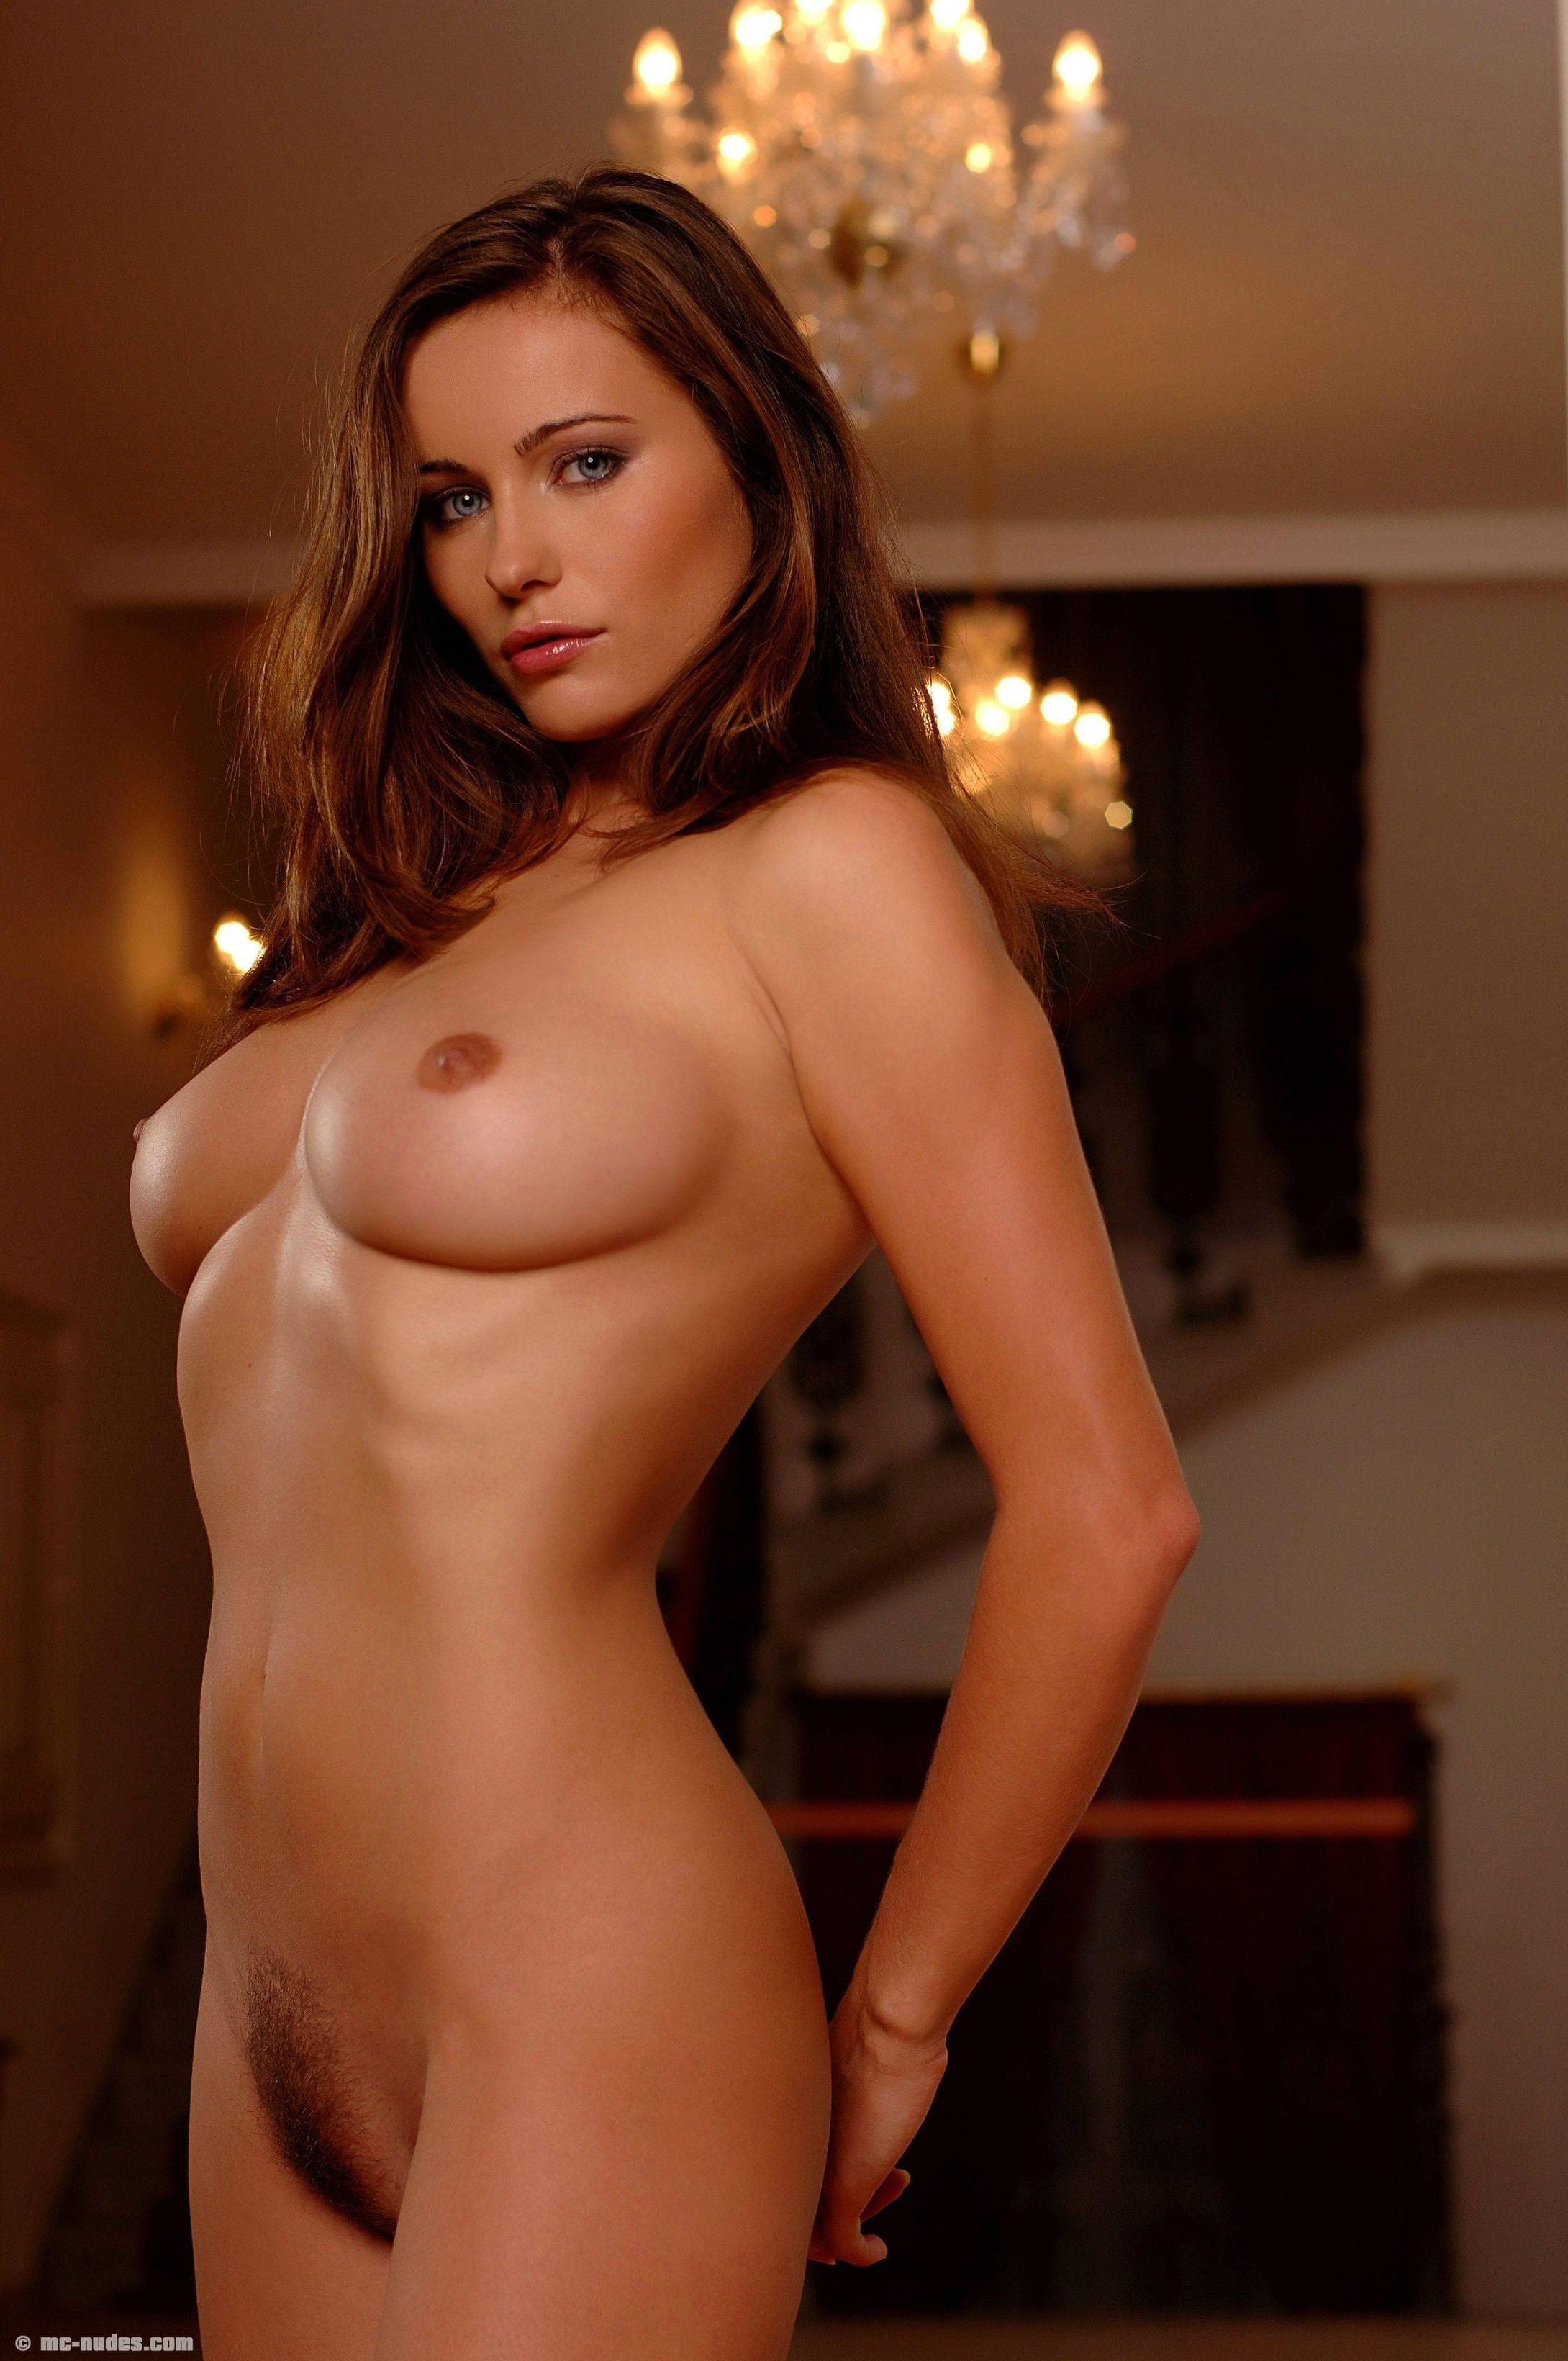 huge-boobs-tits-naked-mix-vol5-96